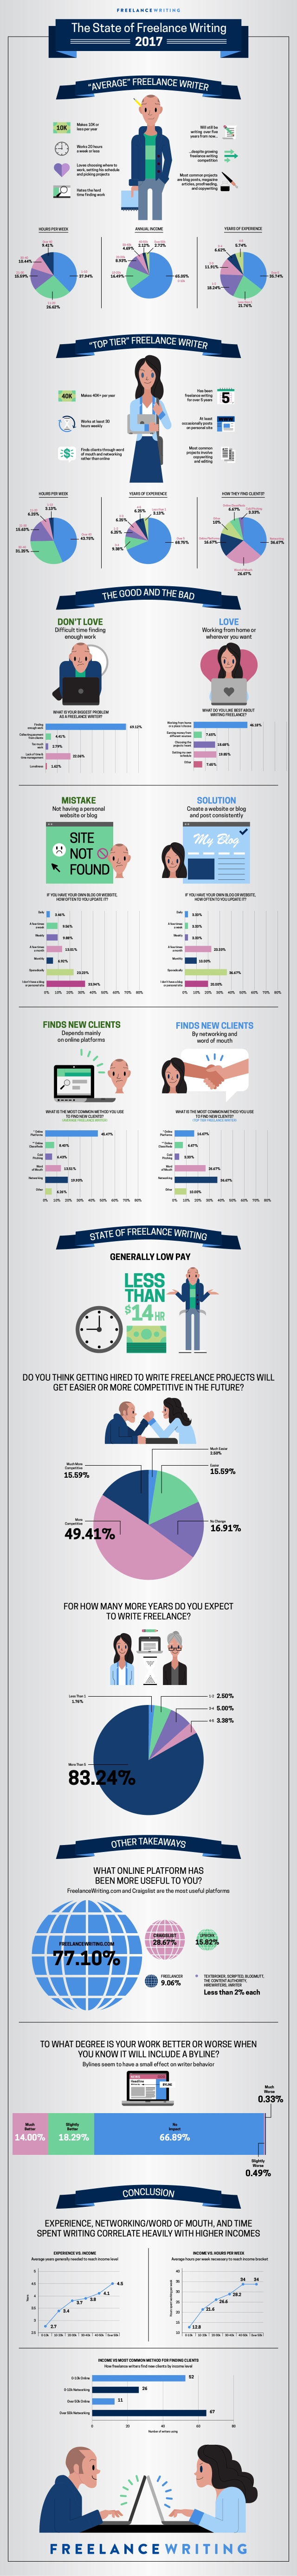 Freelance-Writers-Infographic_Final.jpg